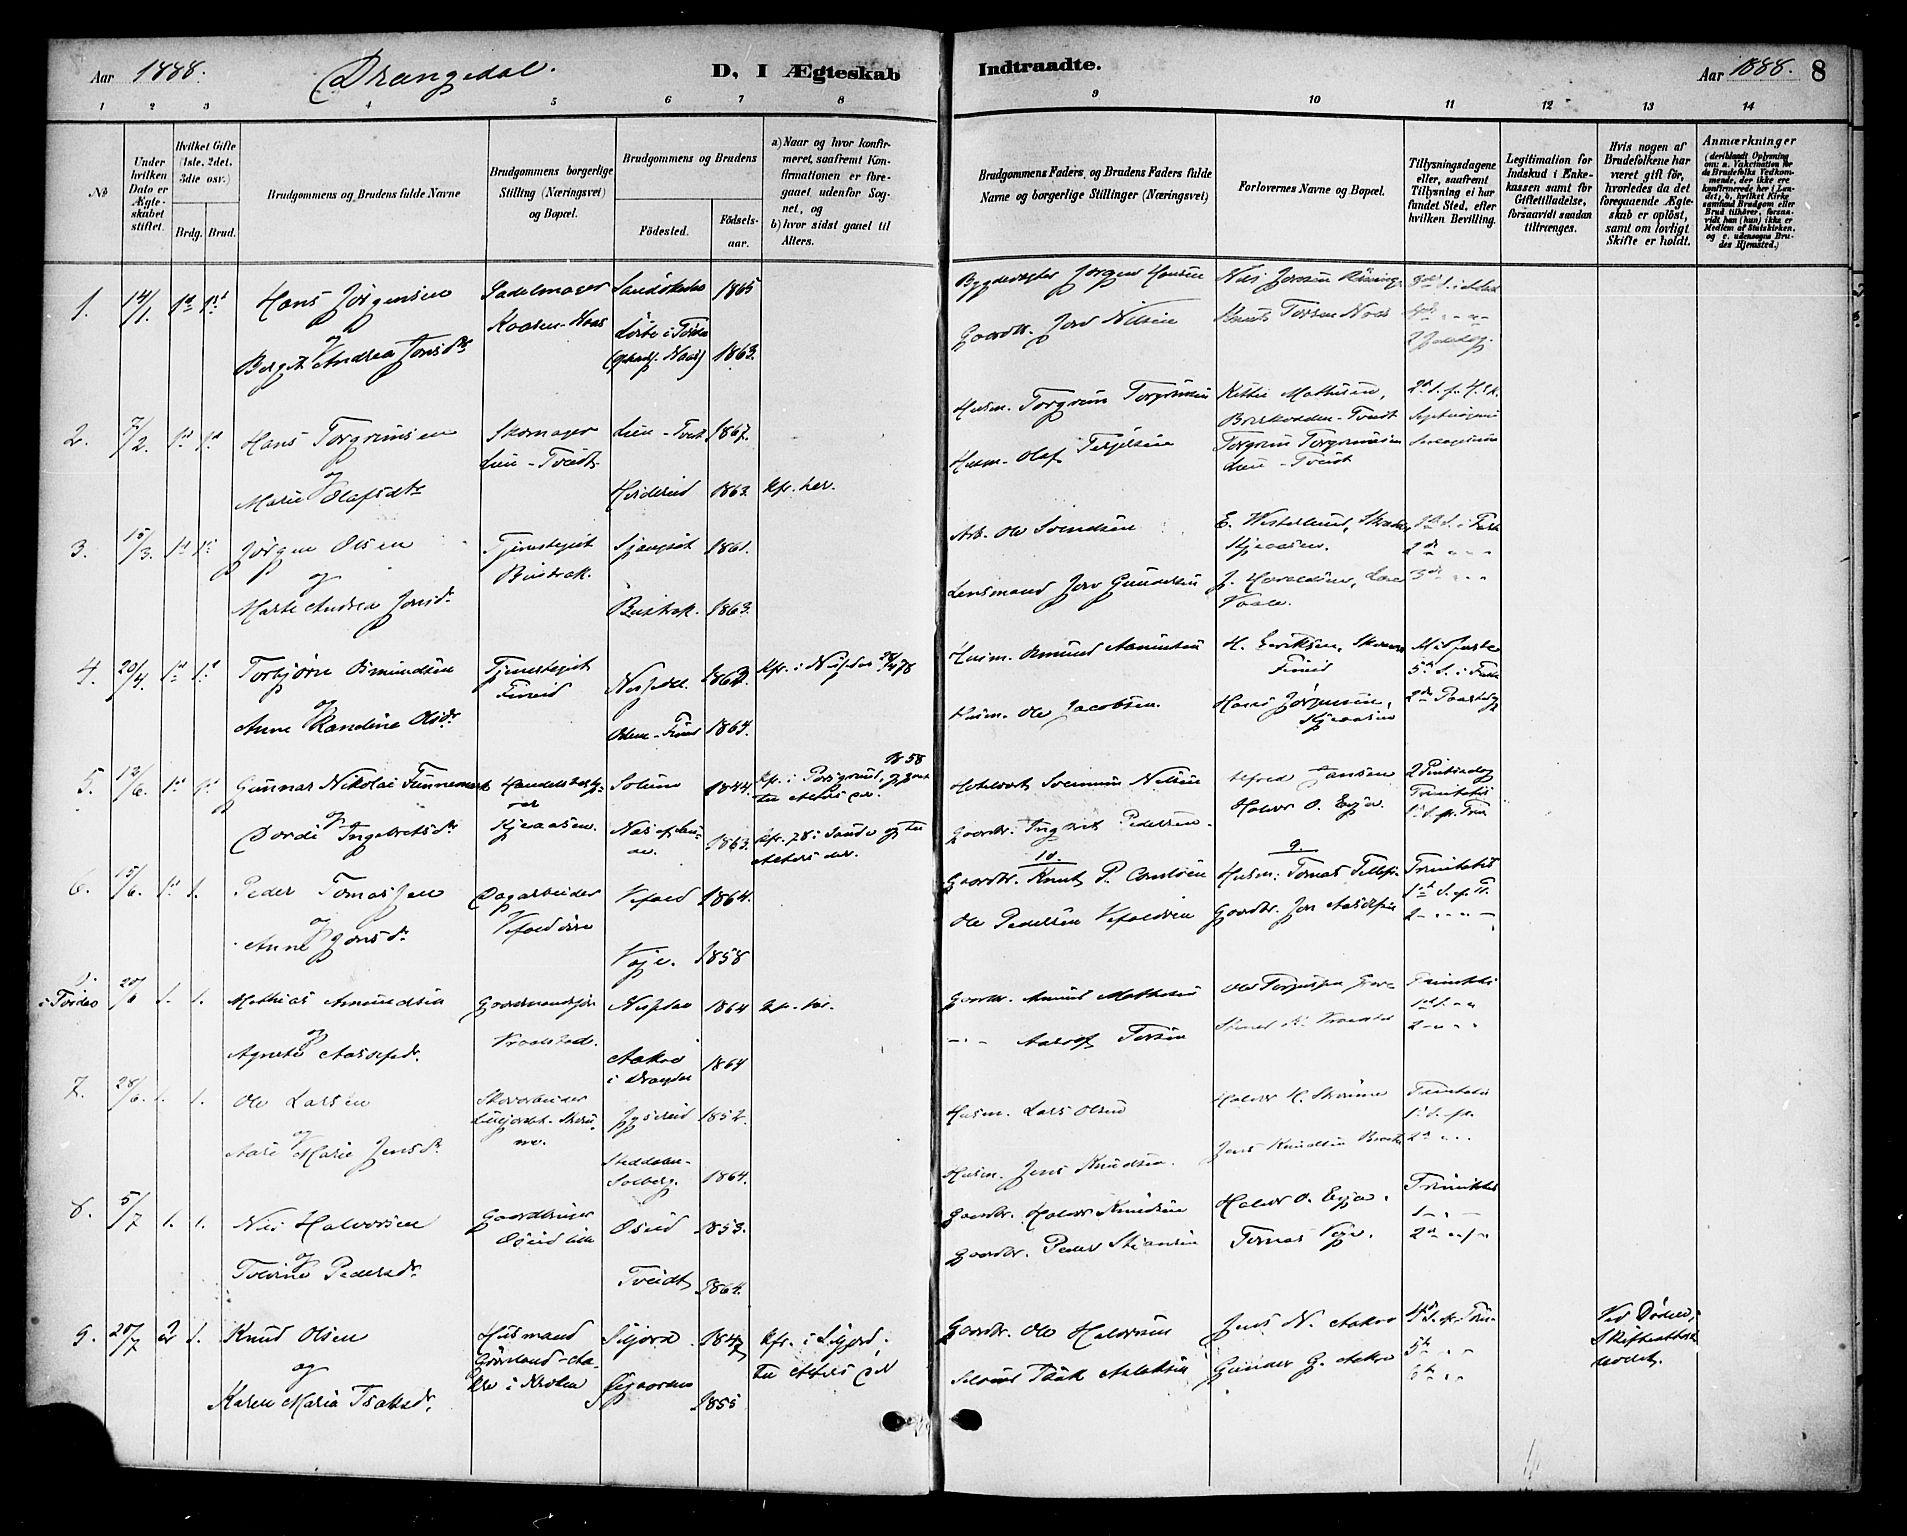 SAKO, Drangedal kirkebøker, F/Fa/L0011: Ministerialbok nr. 11 /1, 1885-1894, s. 8